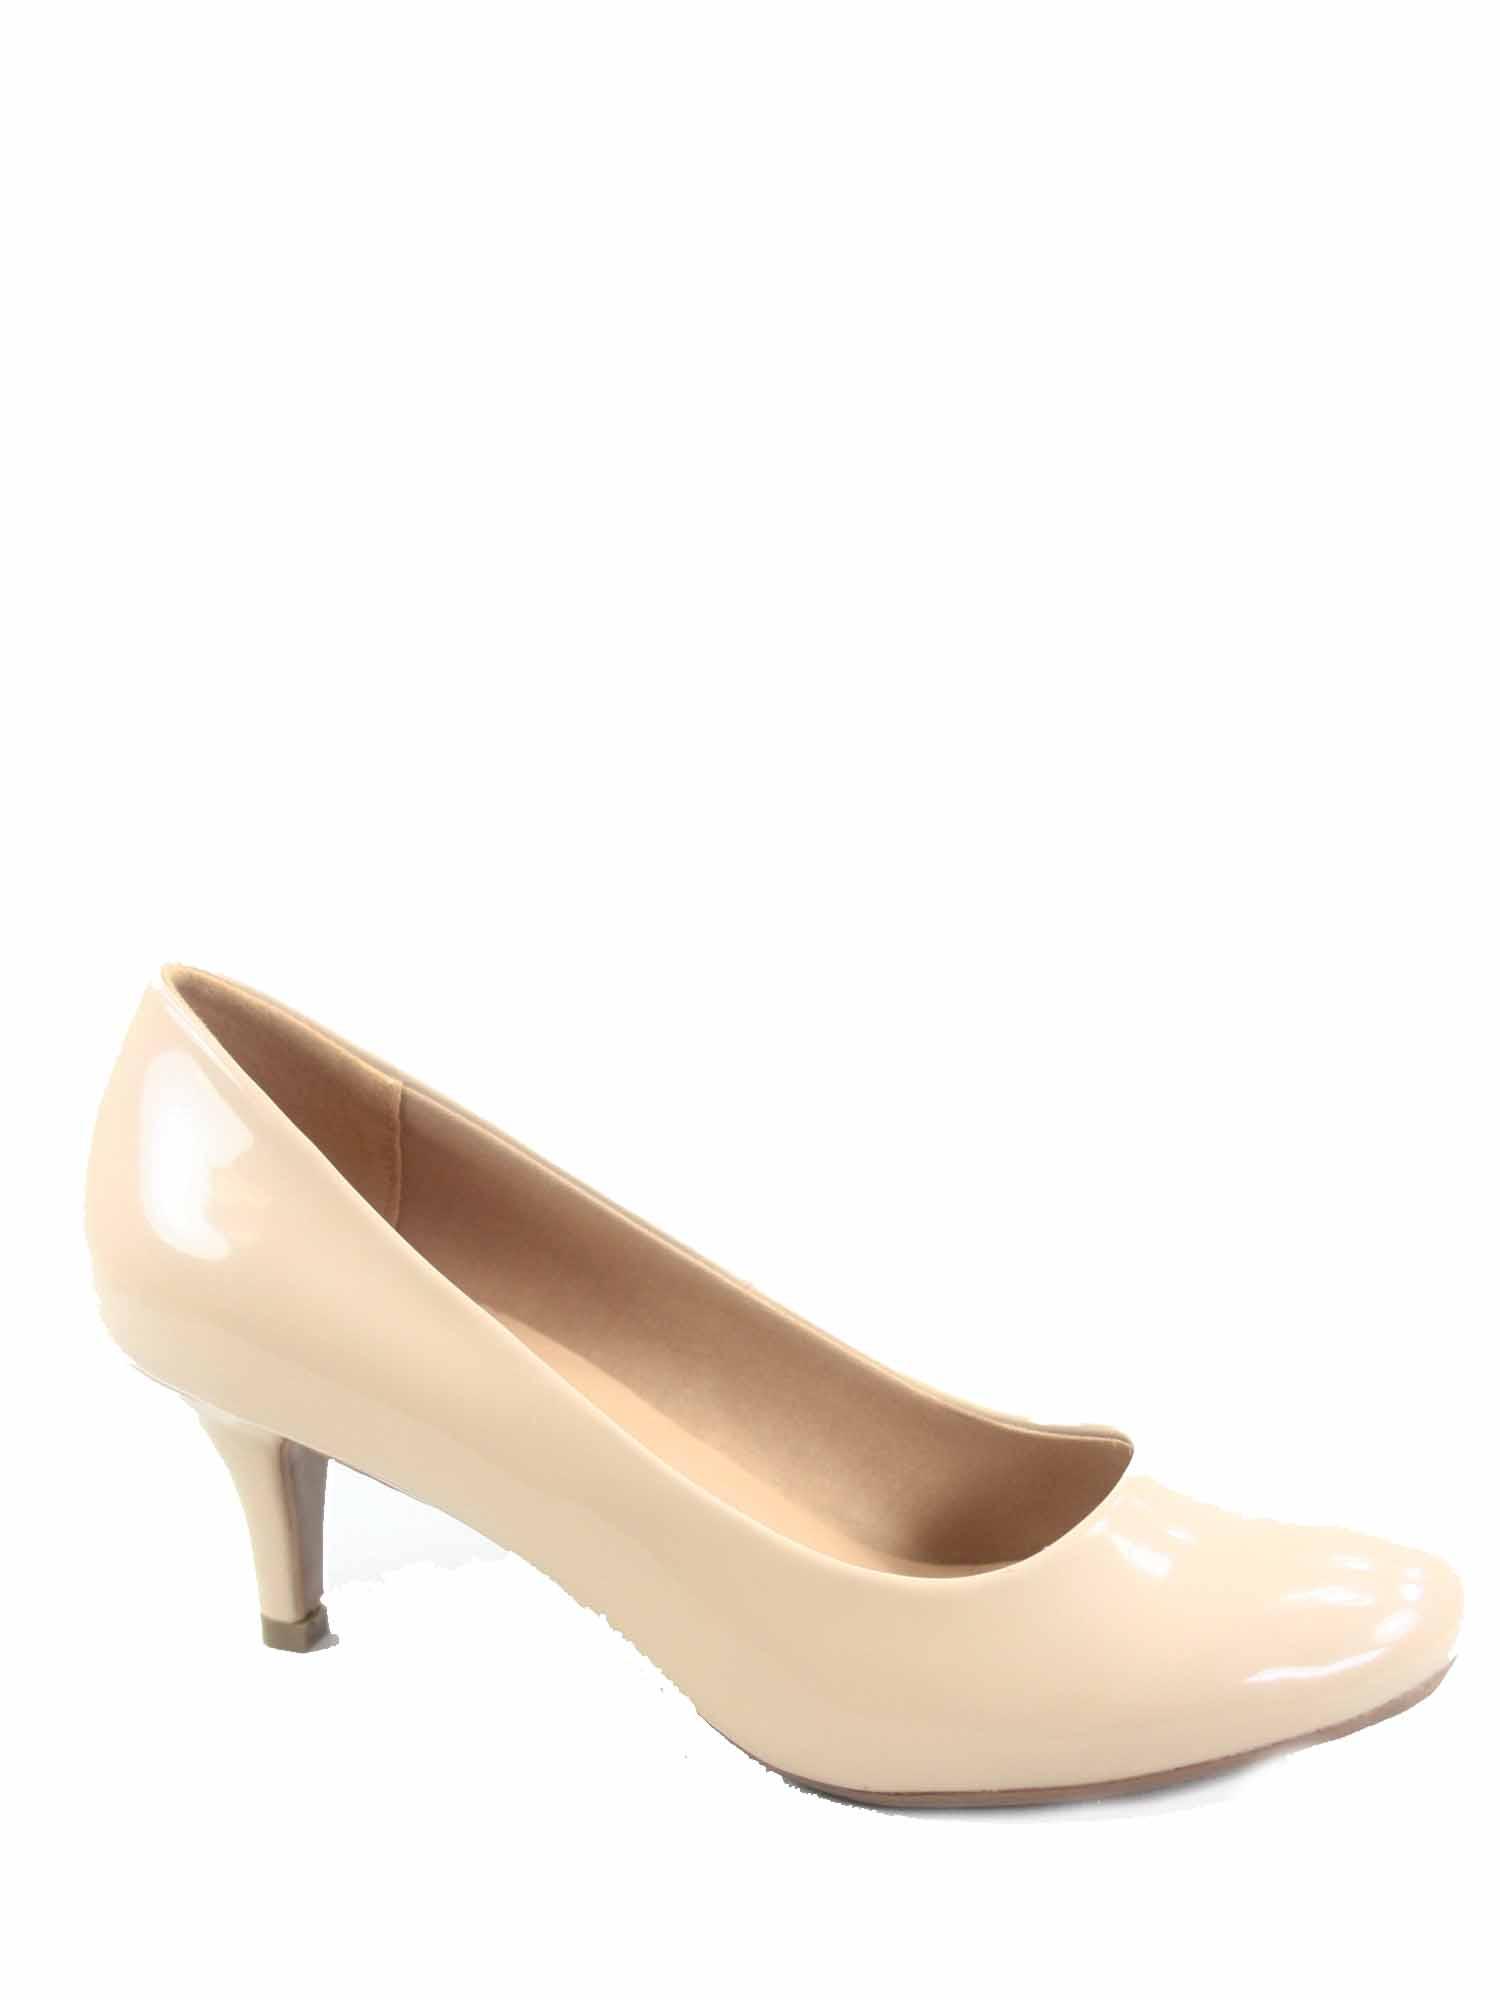 Debbie-32 Women's Fashion Round Toe Low Heel Slip On Pump Dress Shoes